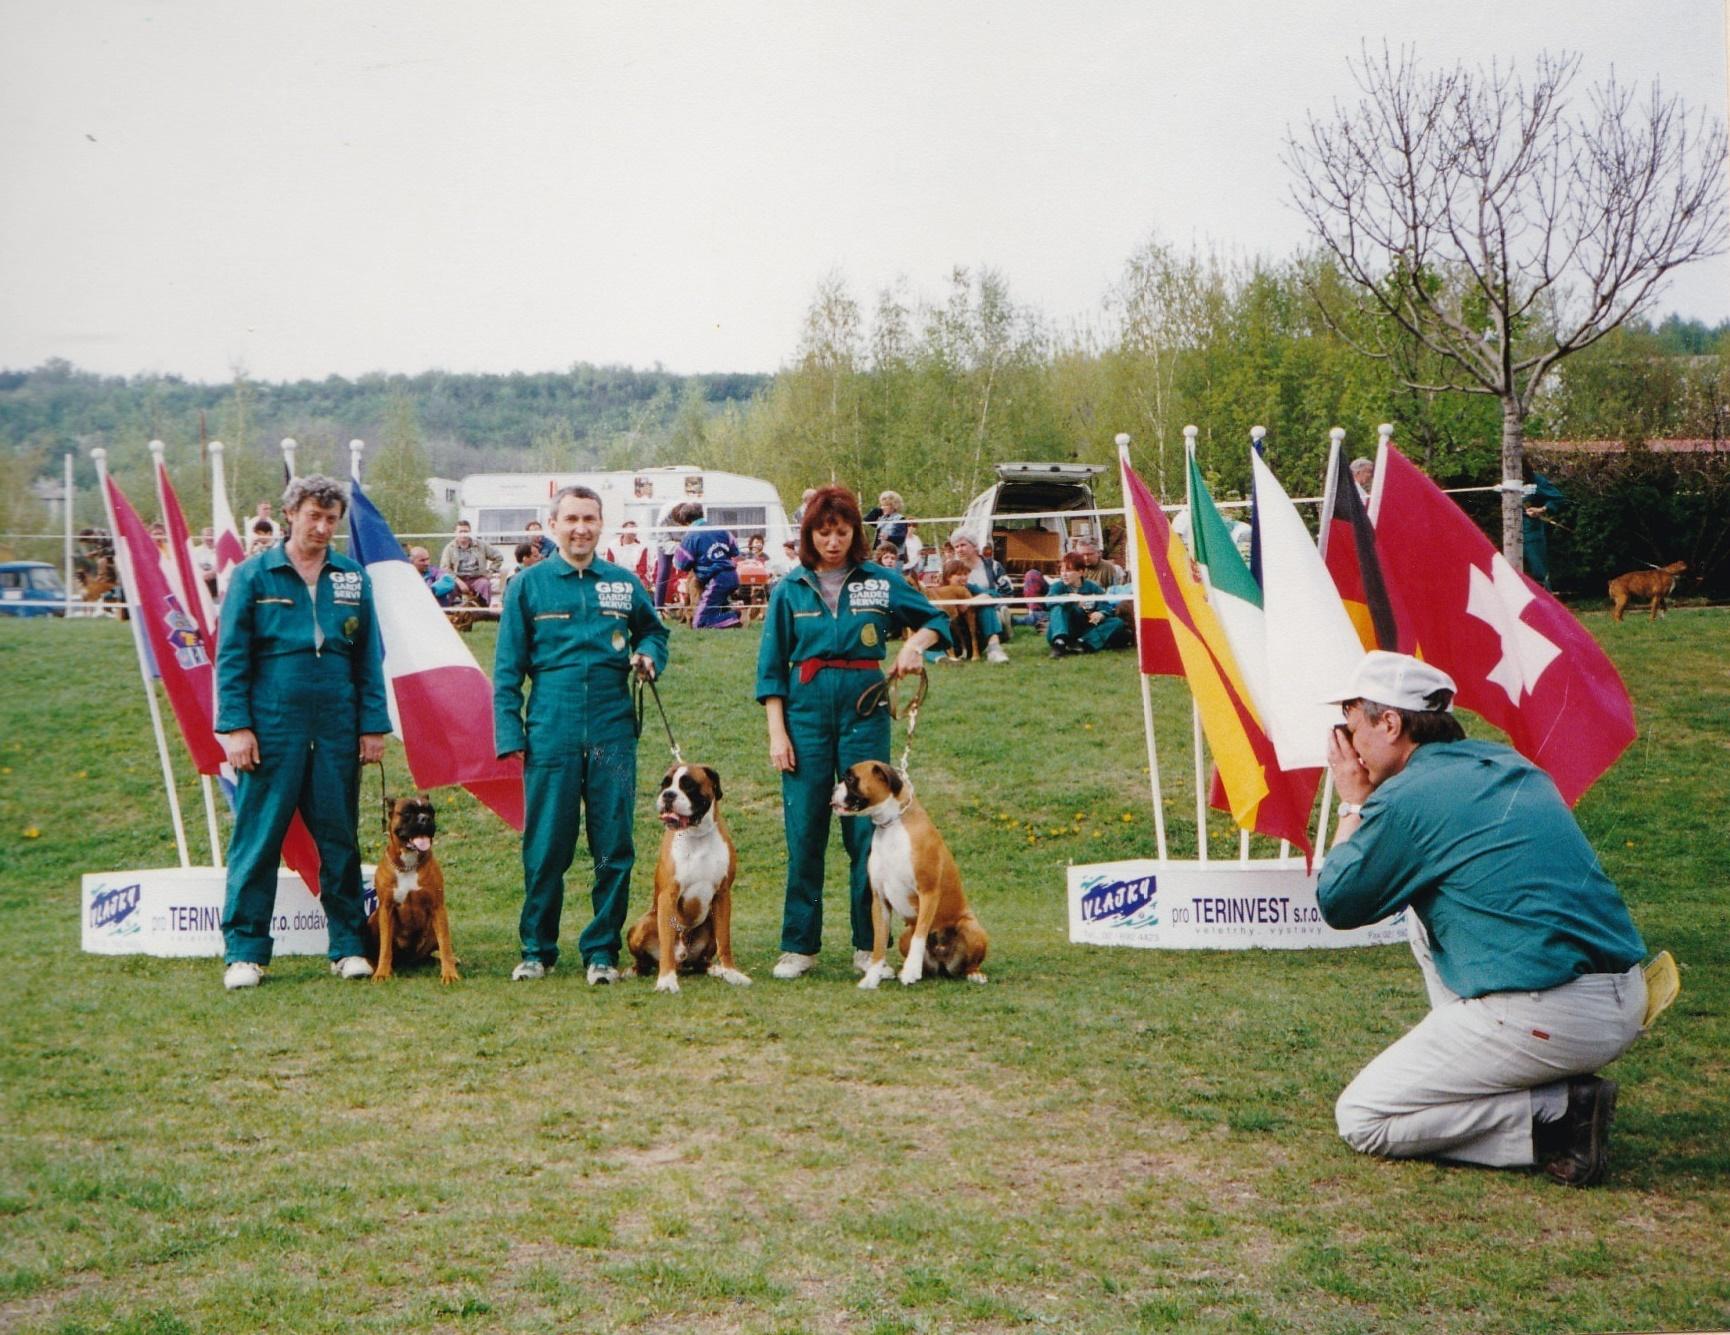 1996 - Atibox